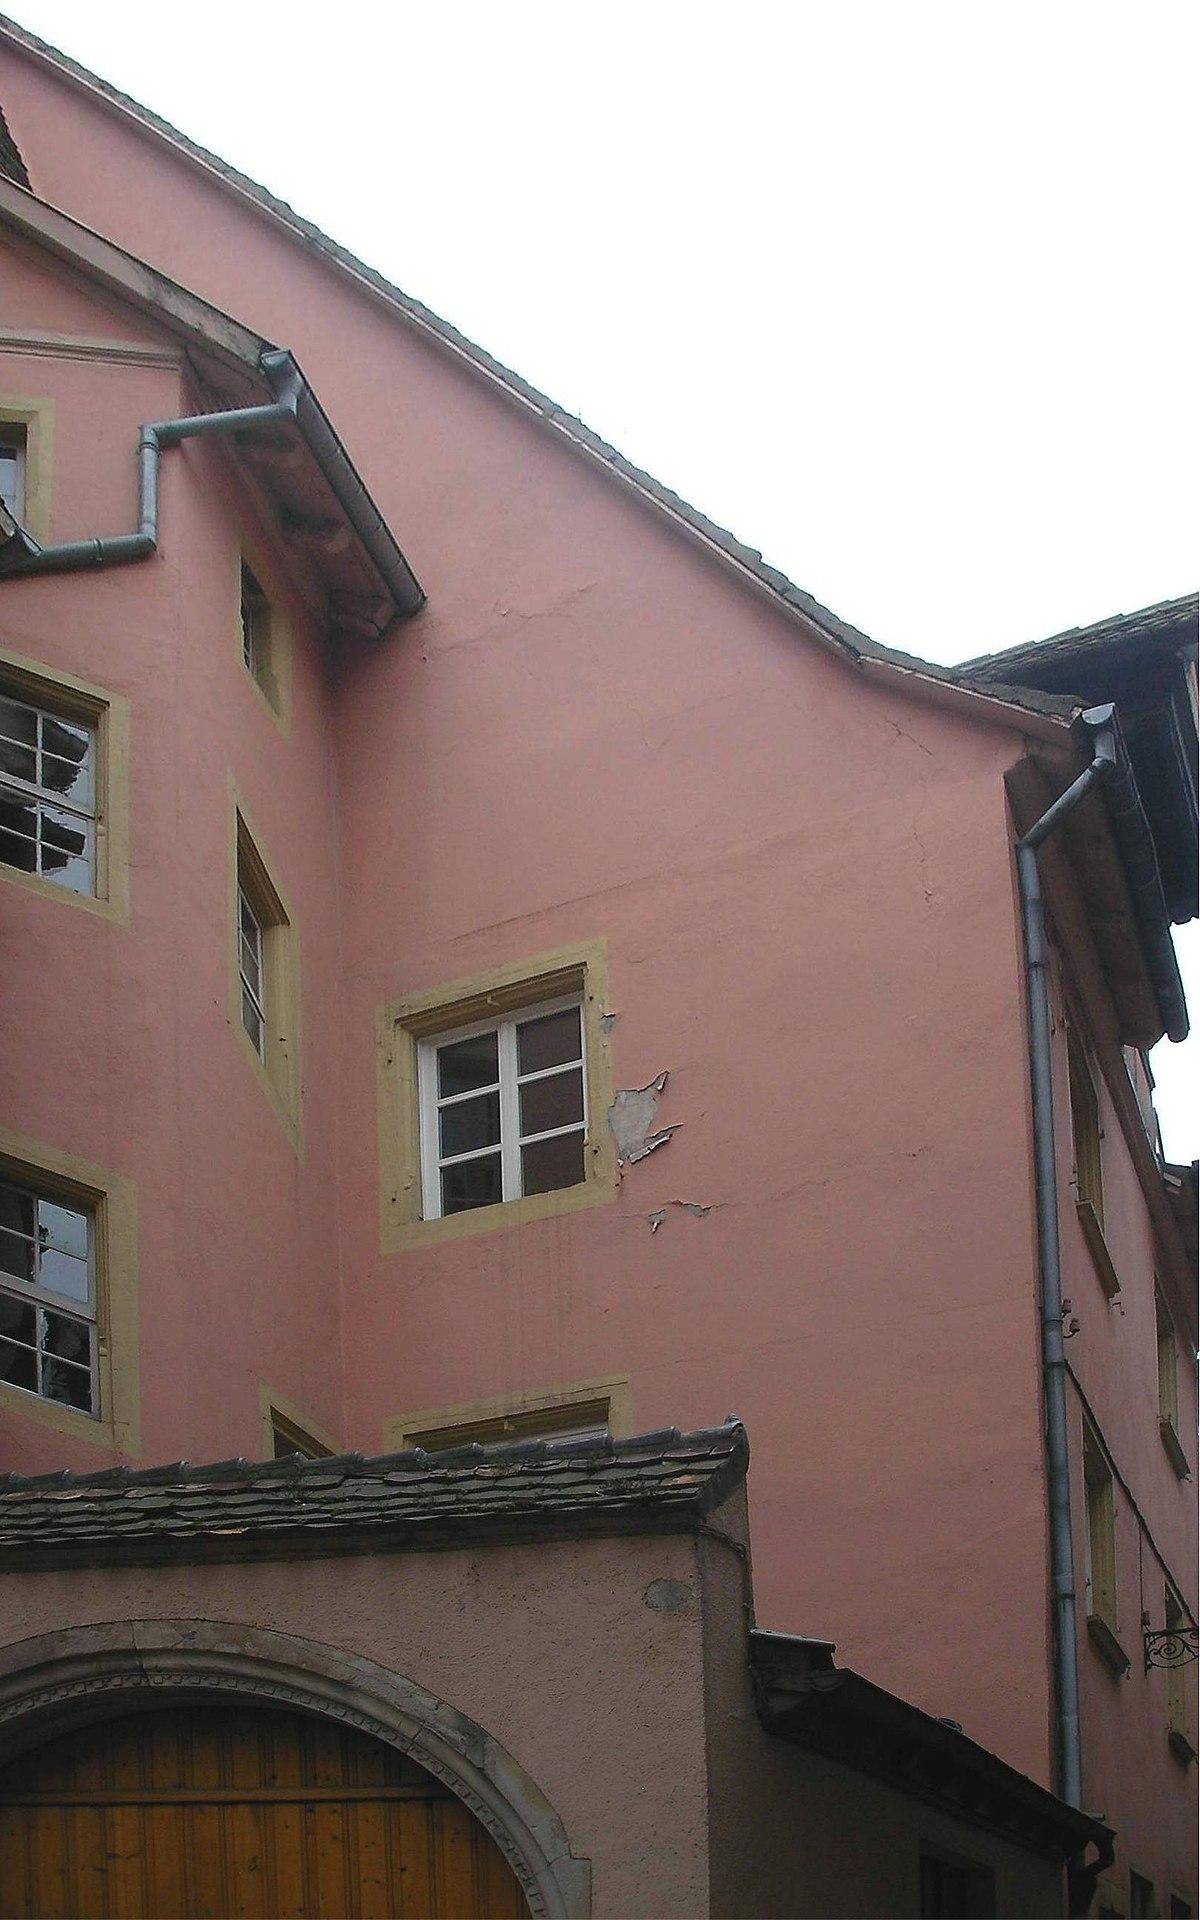 Au Four A Bois Colmar - Maison au 4 rue Saint Martinà Colmar u2014 Wikipédia